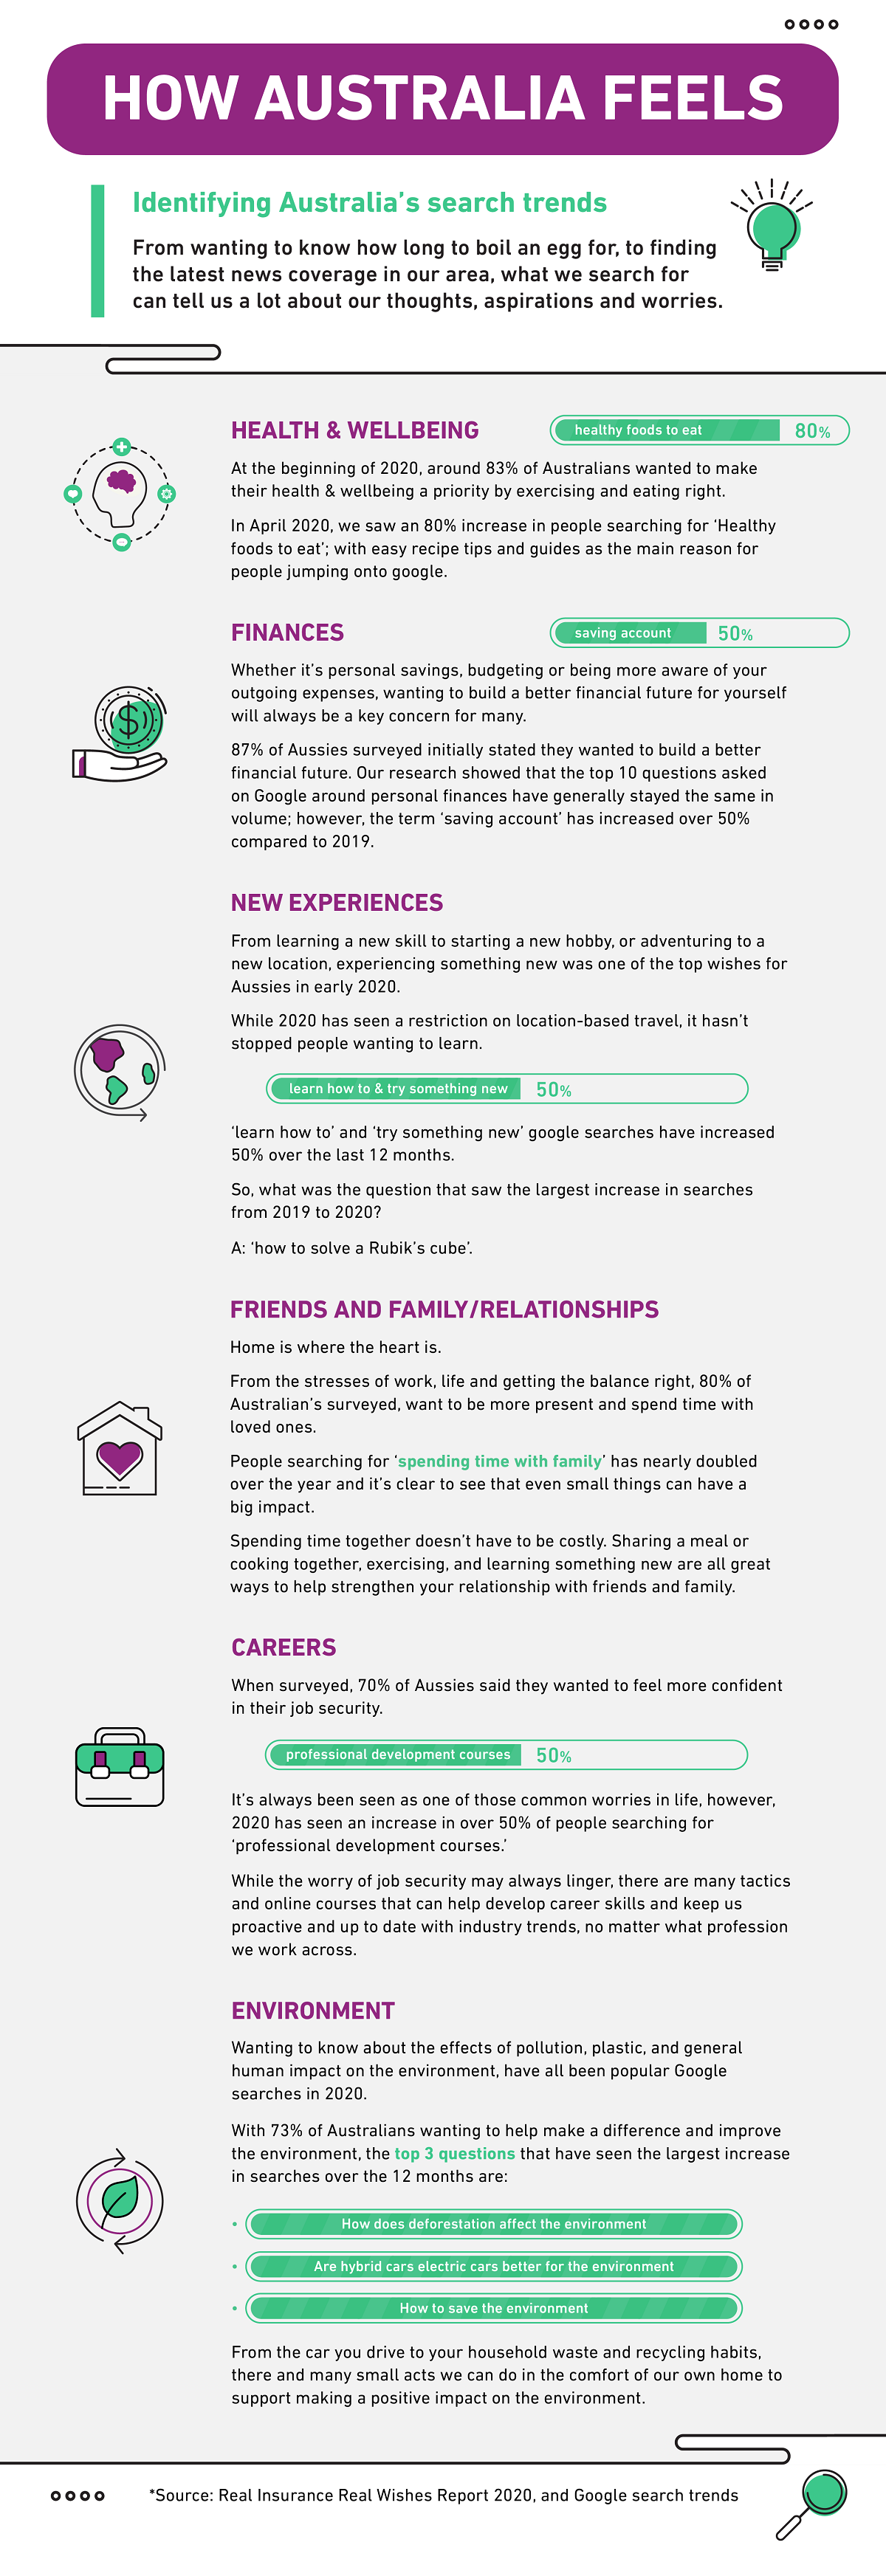 how-australia-feels-infographic